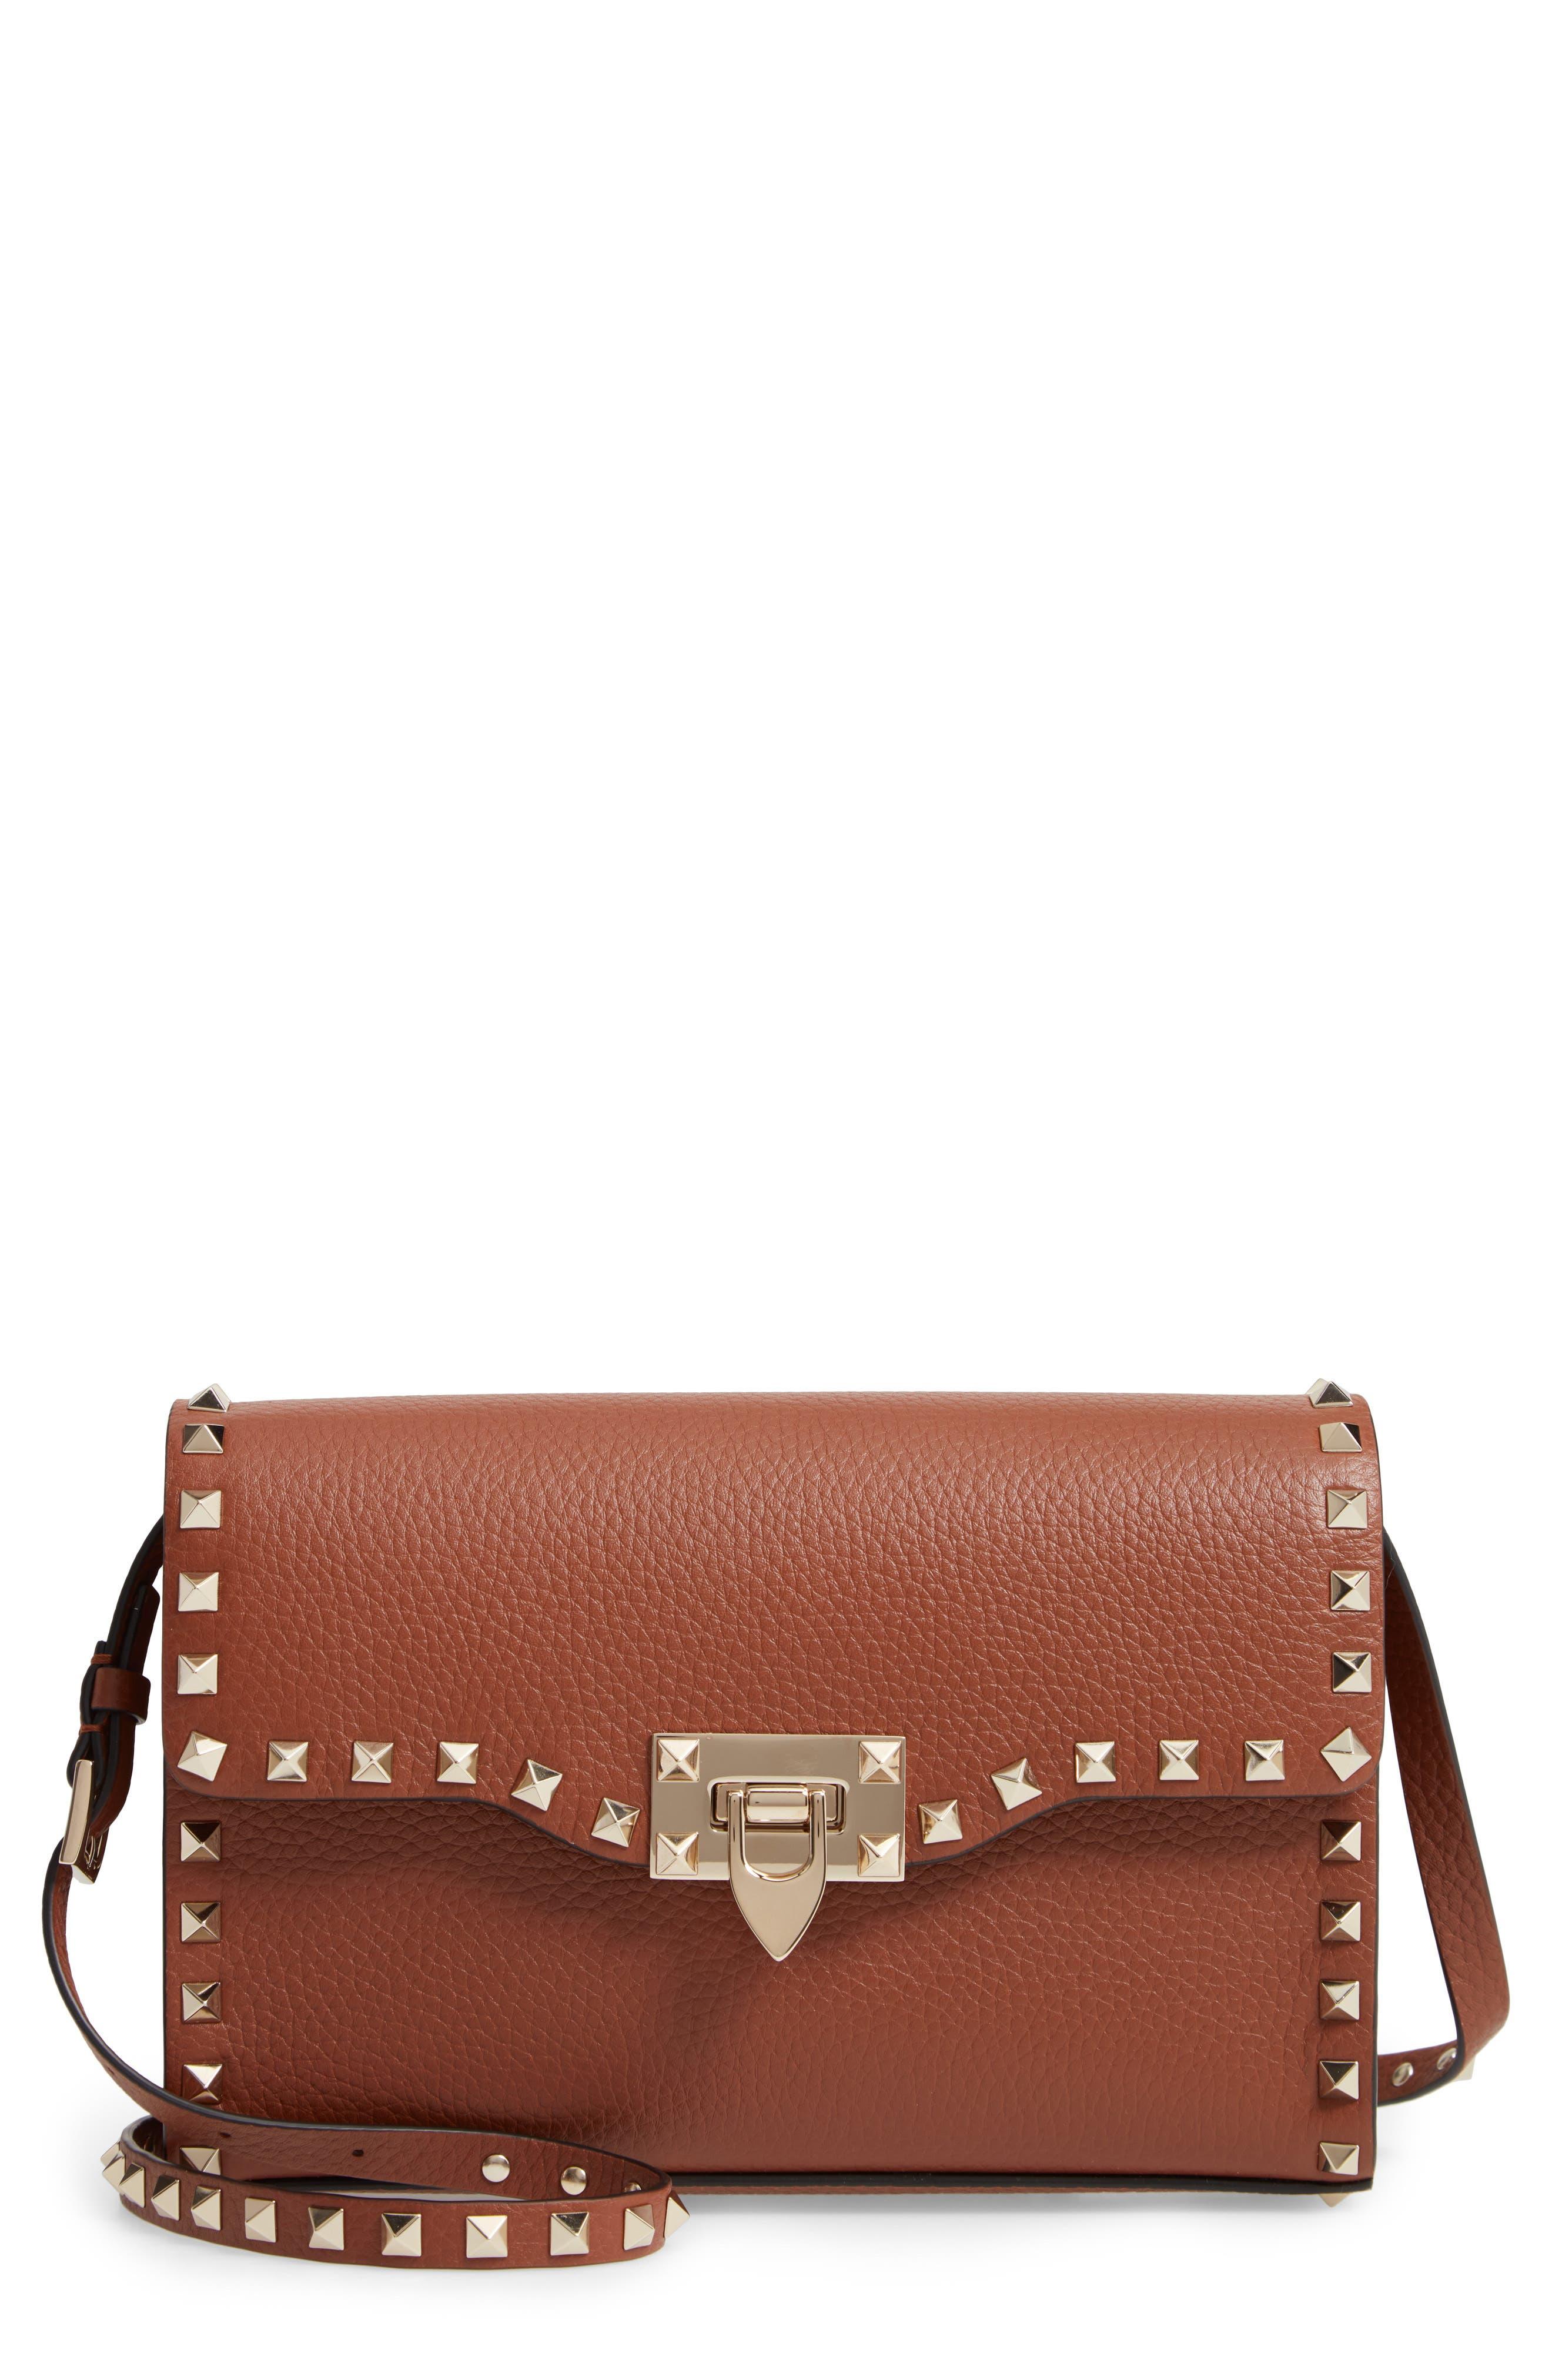 VALENTINO GARAVANI, Medium Rockstud Leather Crossbody Bag, Main thumbnail 1, color, BRIGHT COGNAC